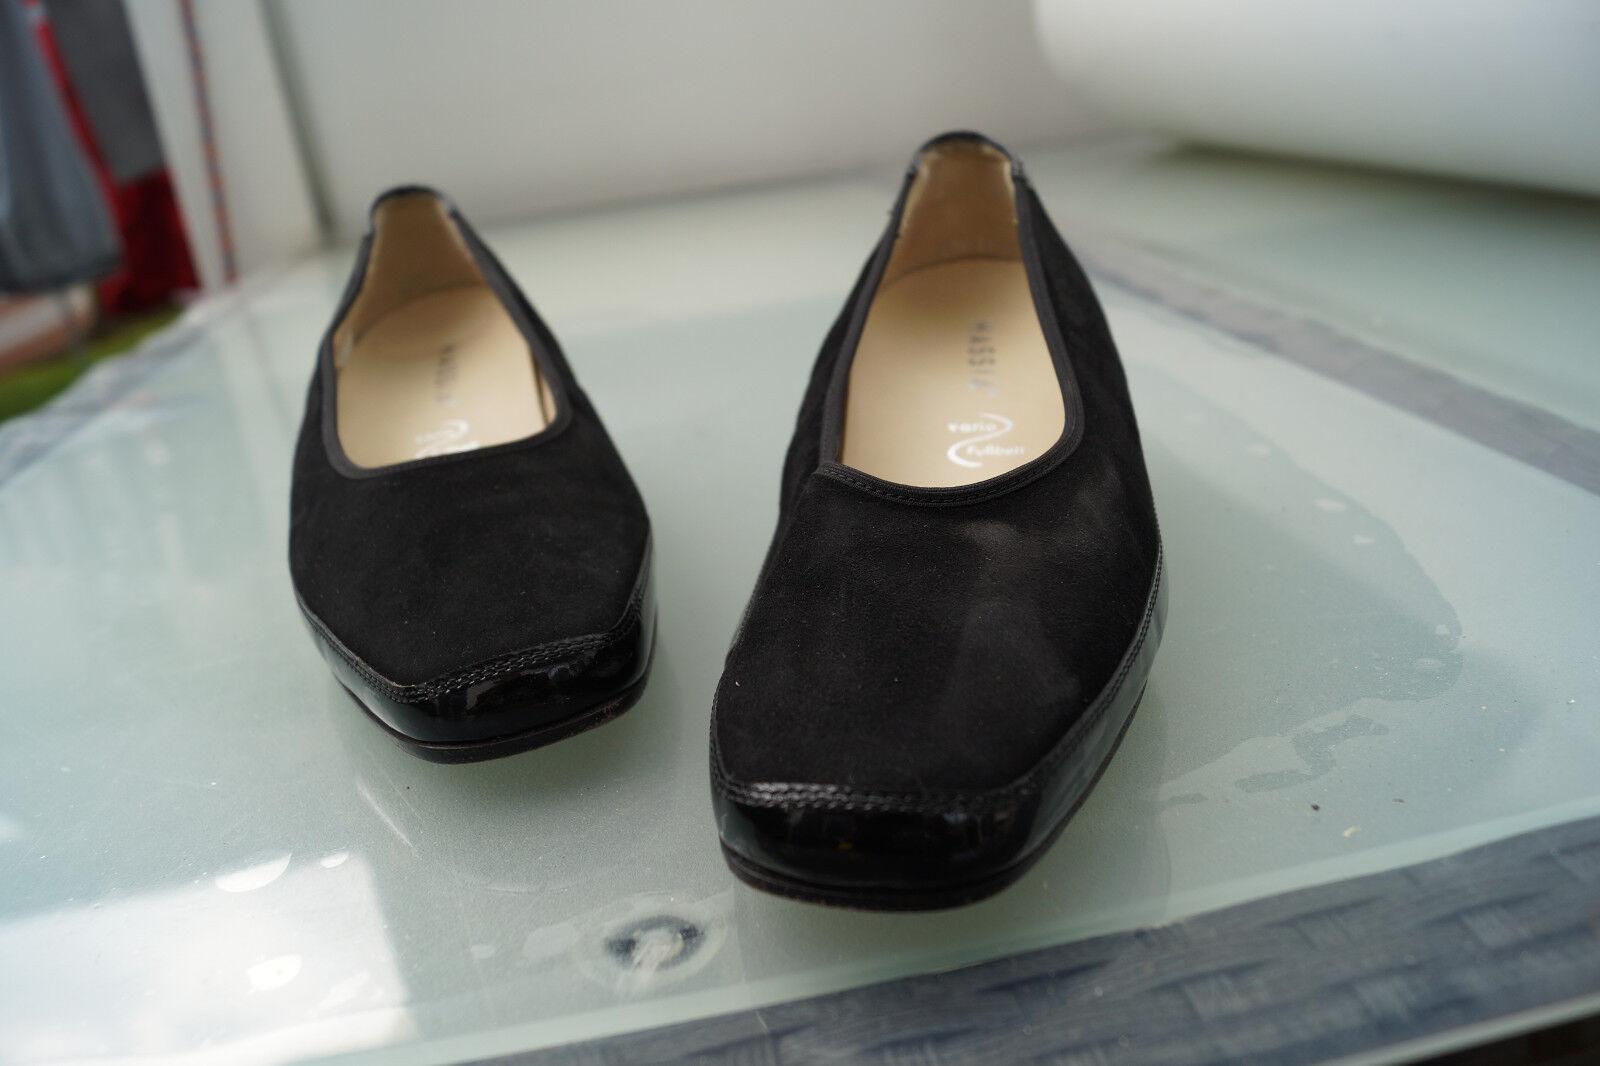 Hassia evelyn Damen Damen Damen Comfort Schuhe Pumps Einlagen Gr.3,5   36 schwarz Leder  52 2efdec